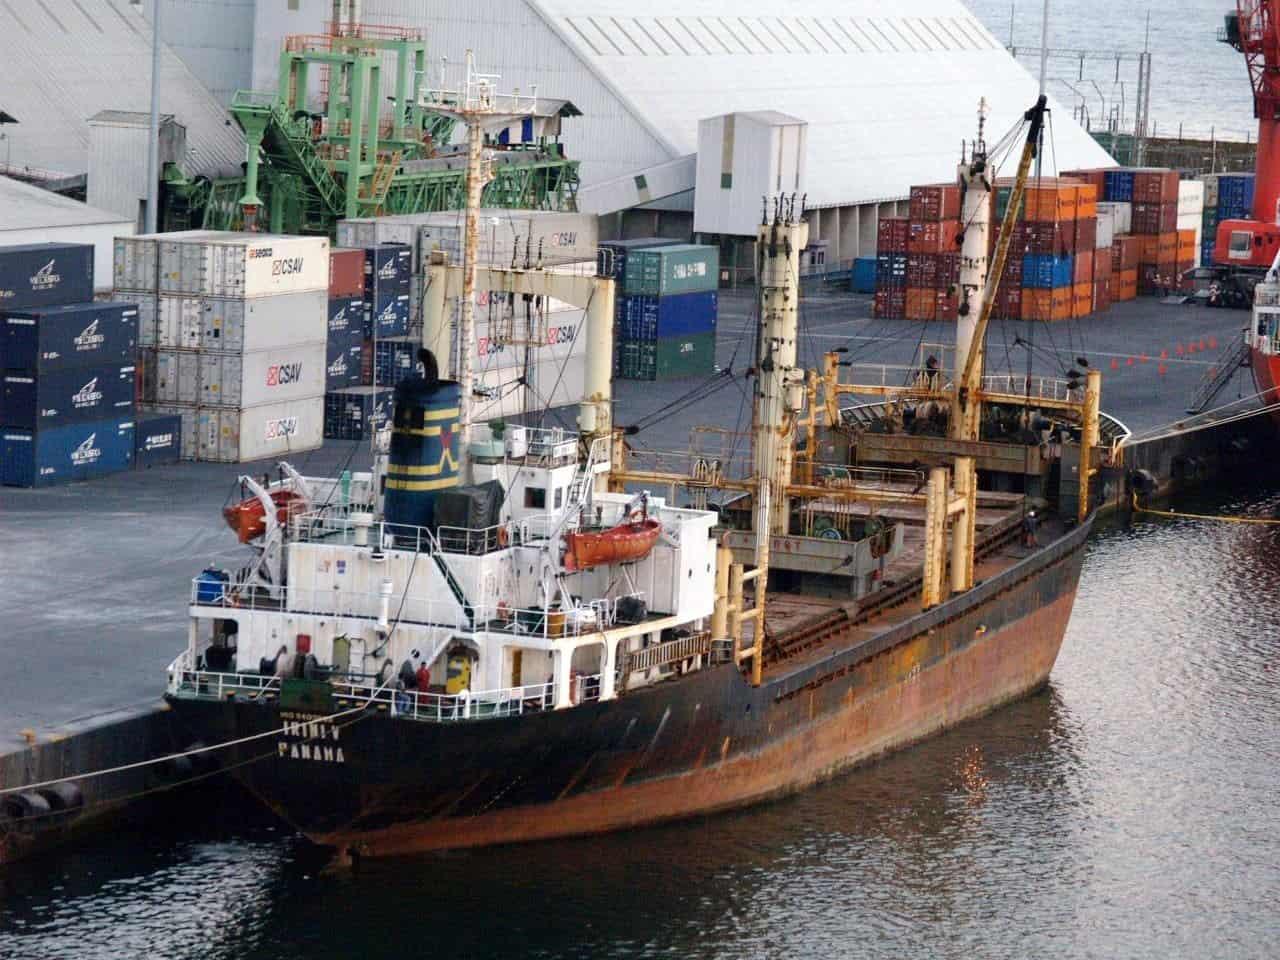 A ship docked at Guatemala's Puerto Quetzal.